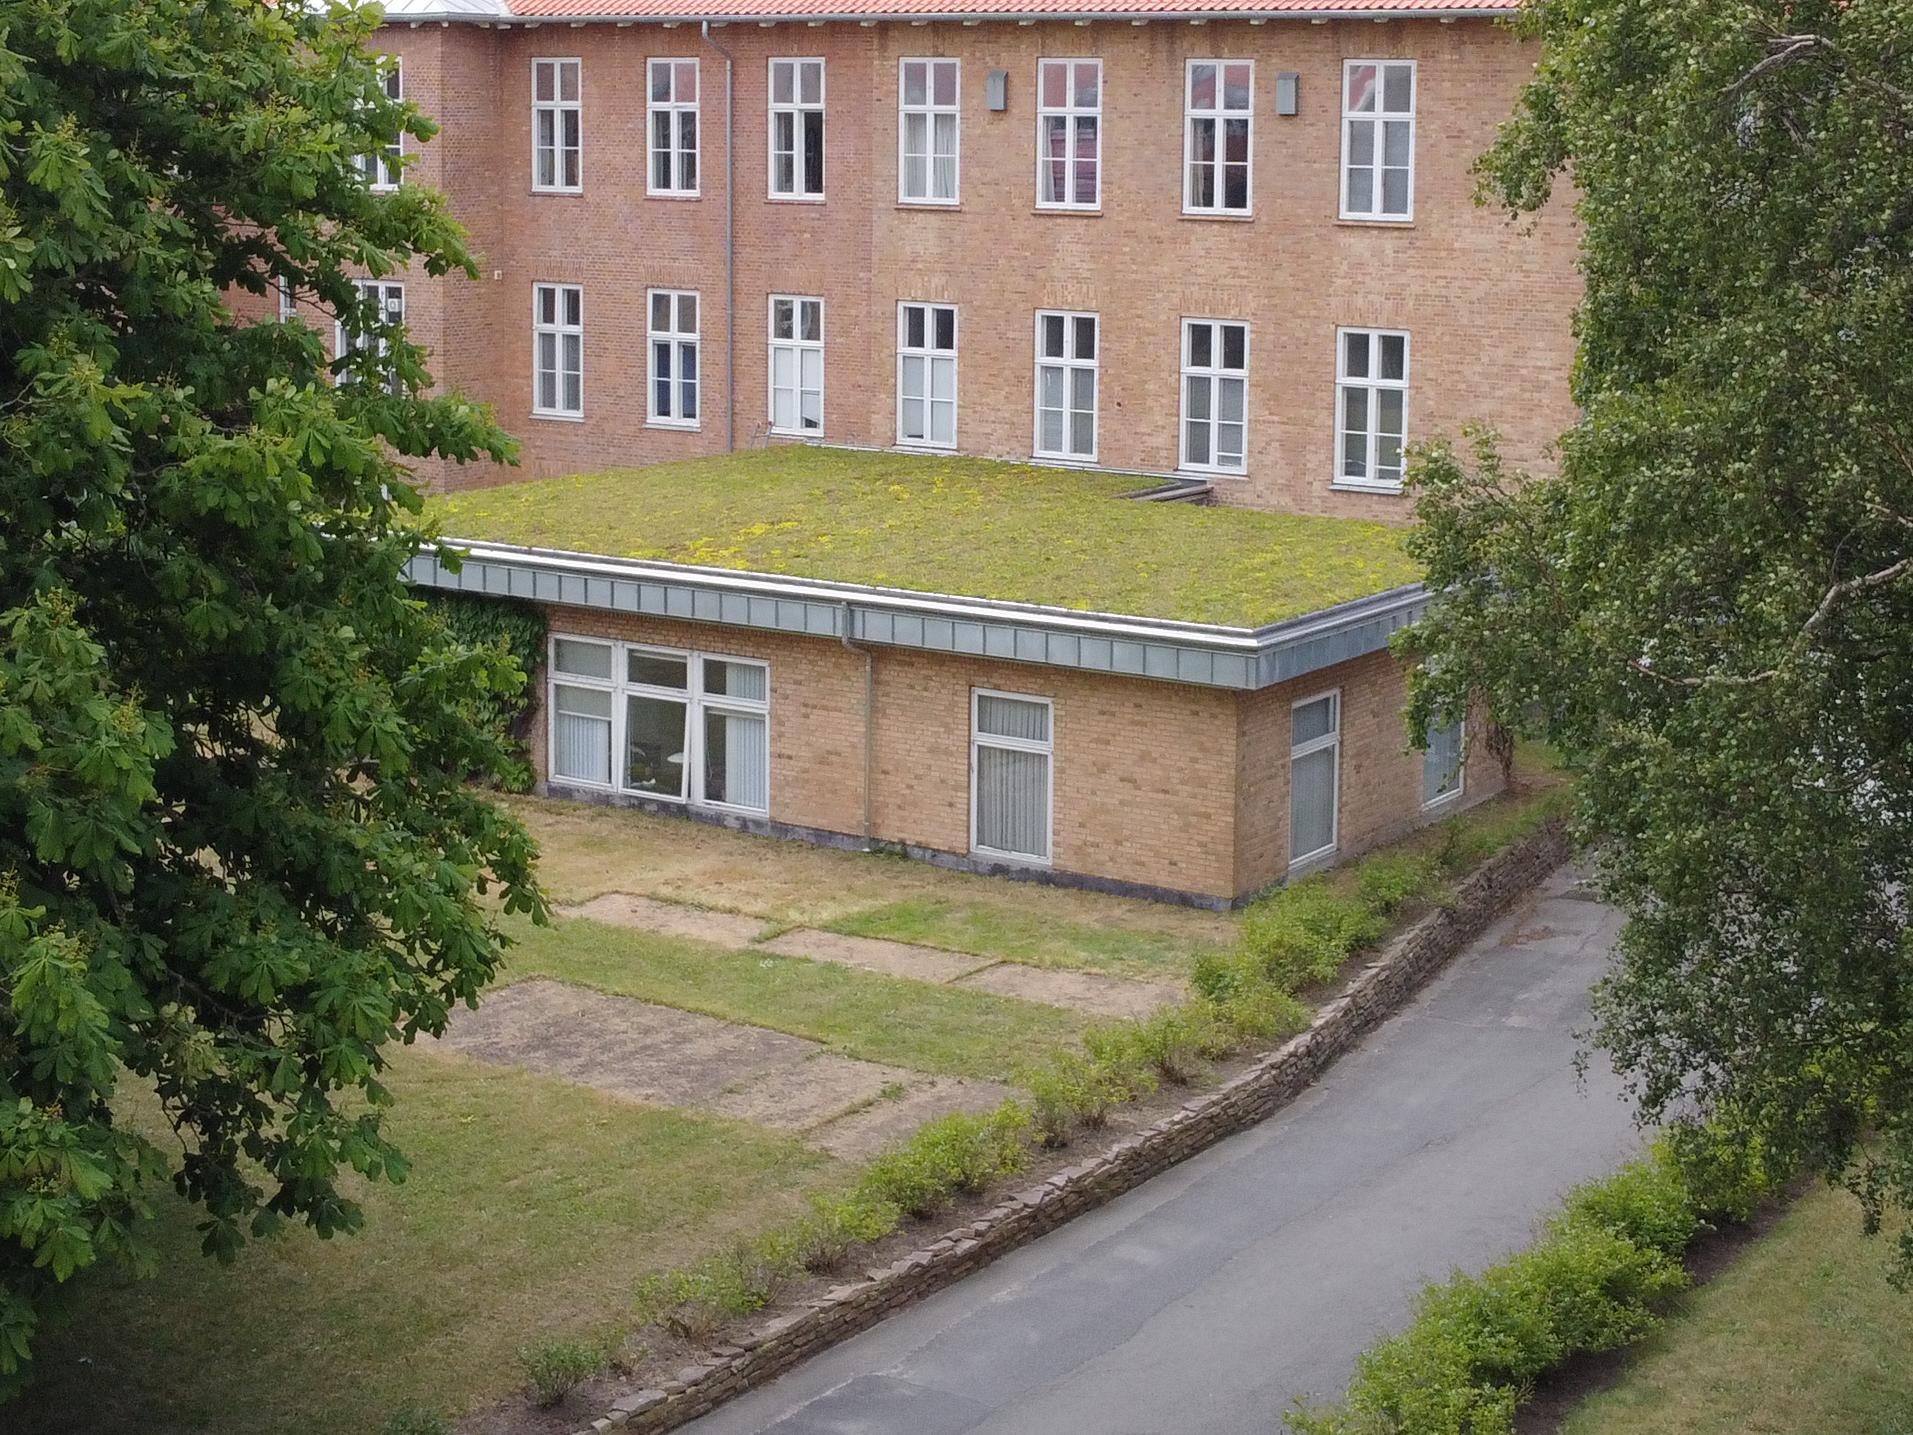 Tagrenovering på Bornholms Hospital